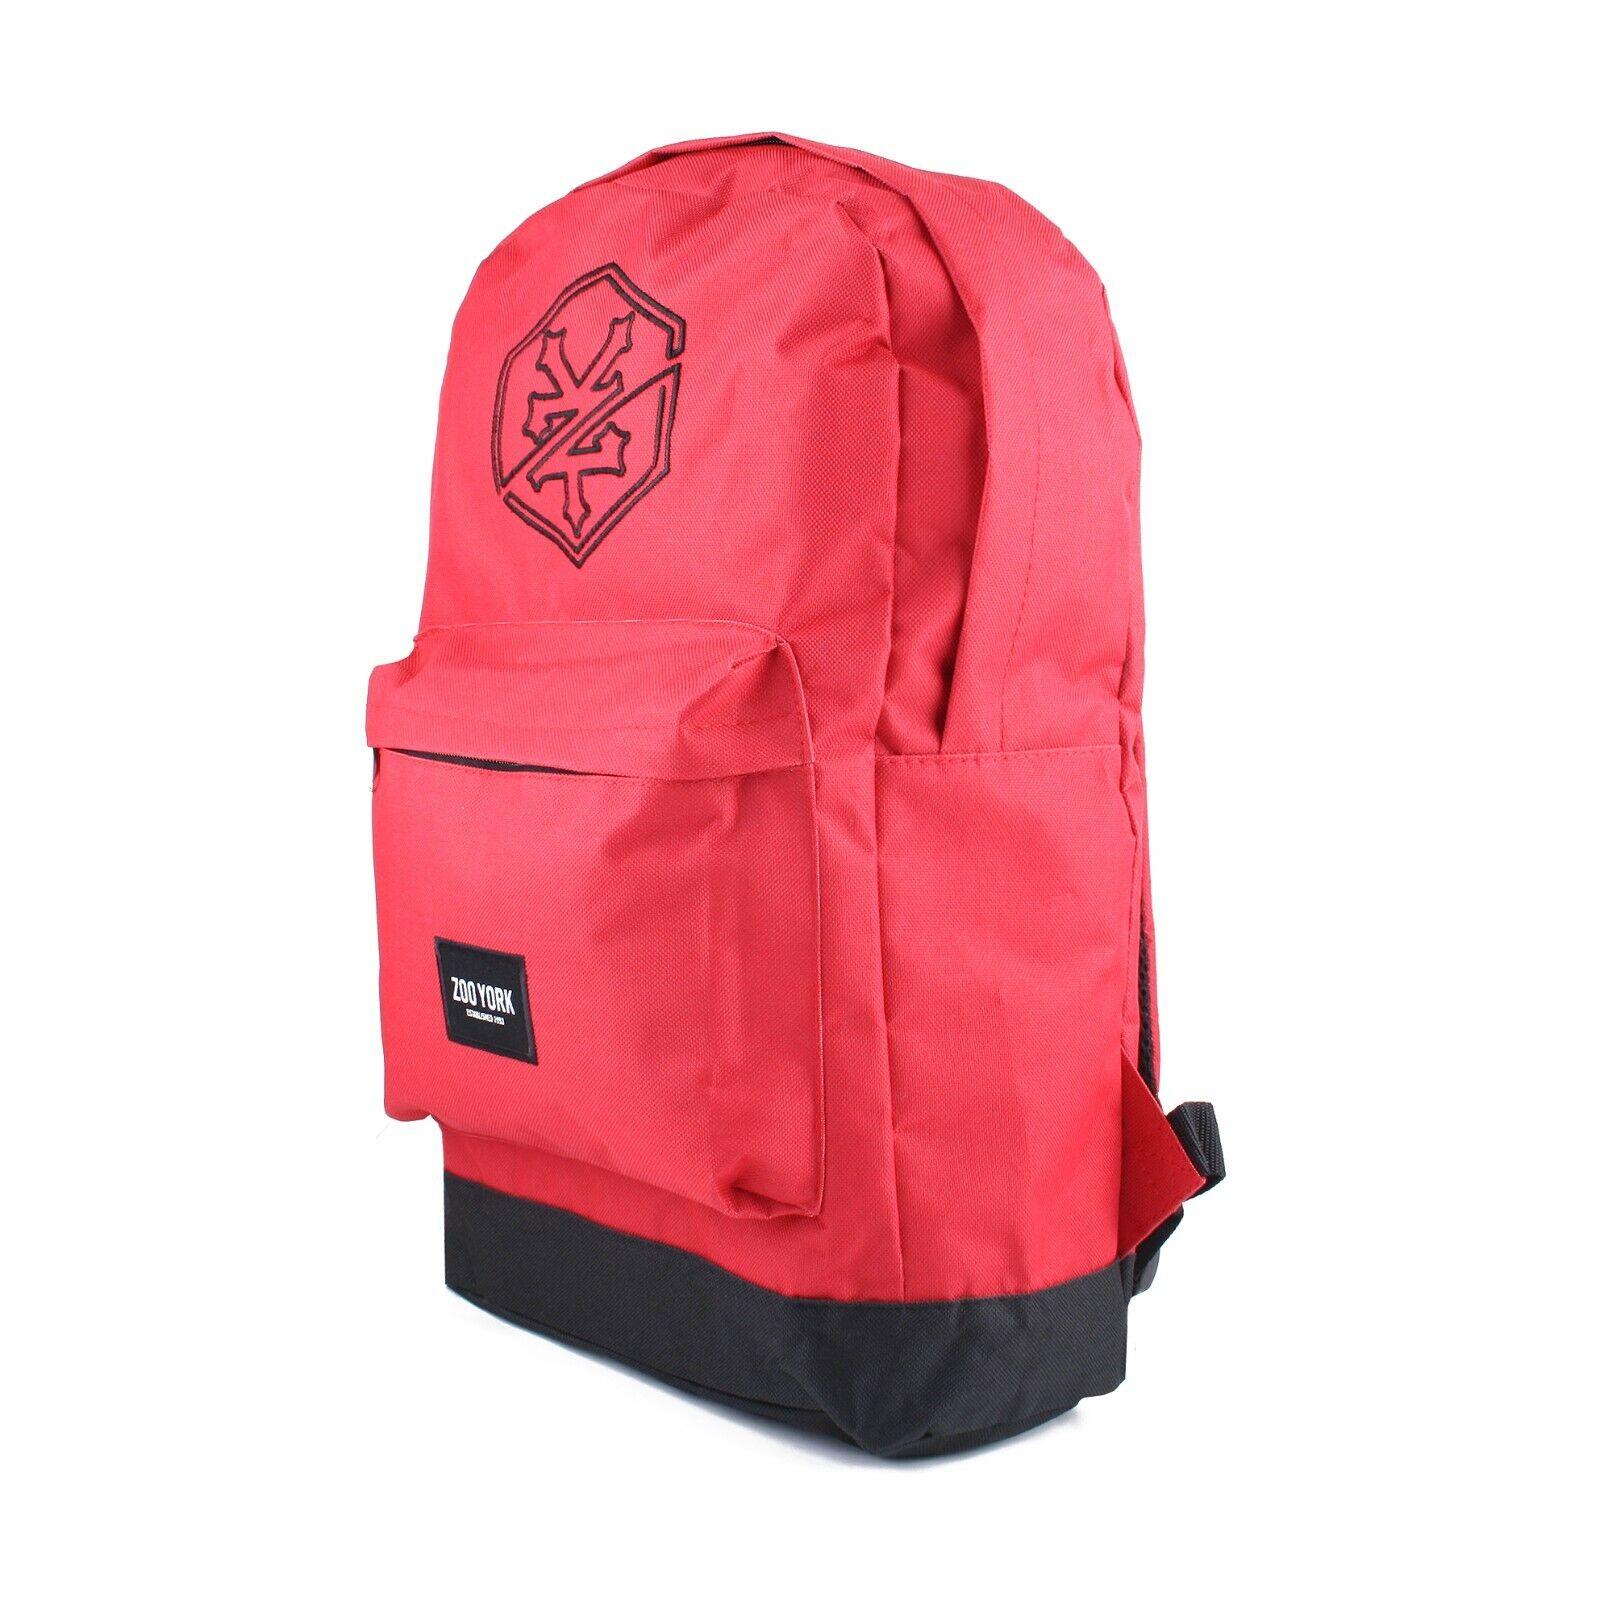 Zoo York - Auburn - Mens - Backpack - Red/Black - One Size